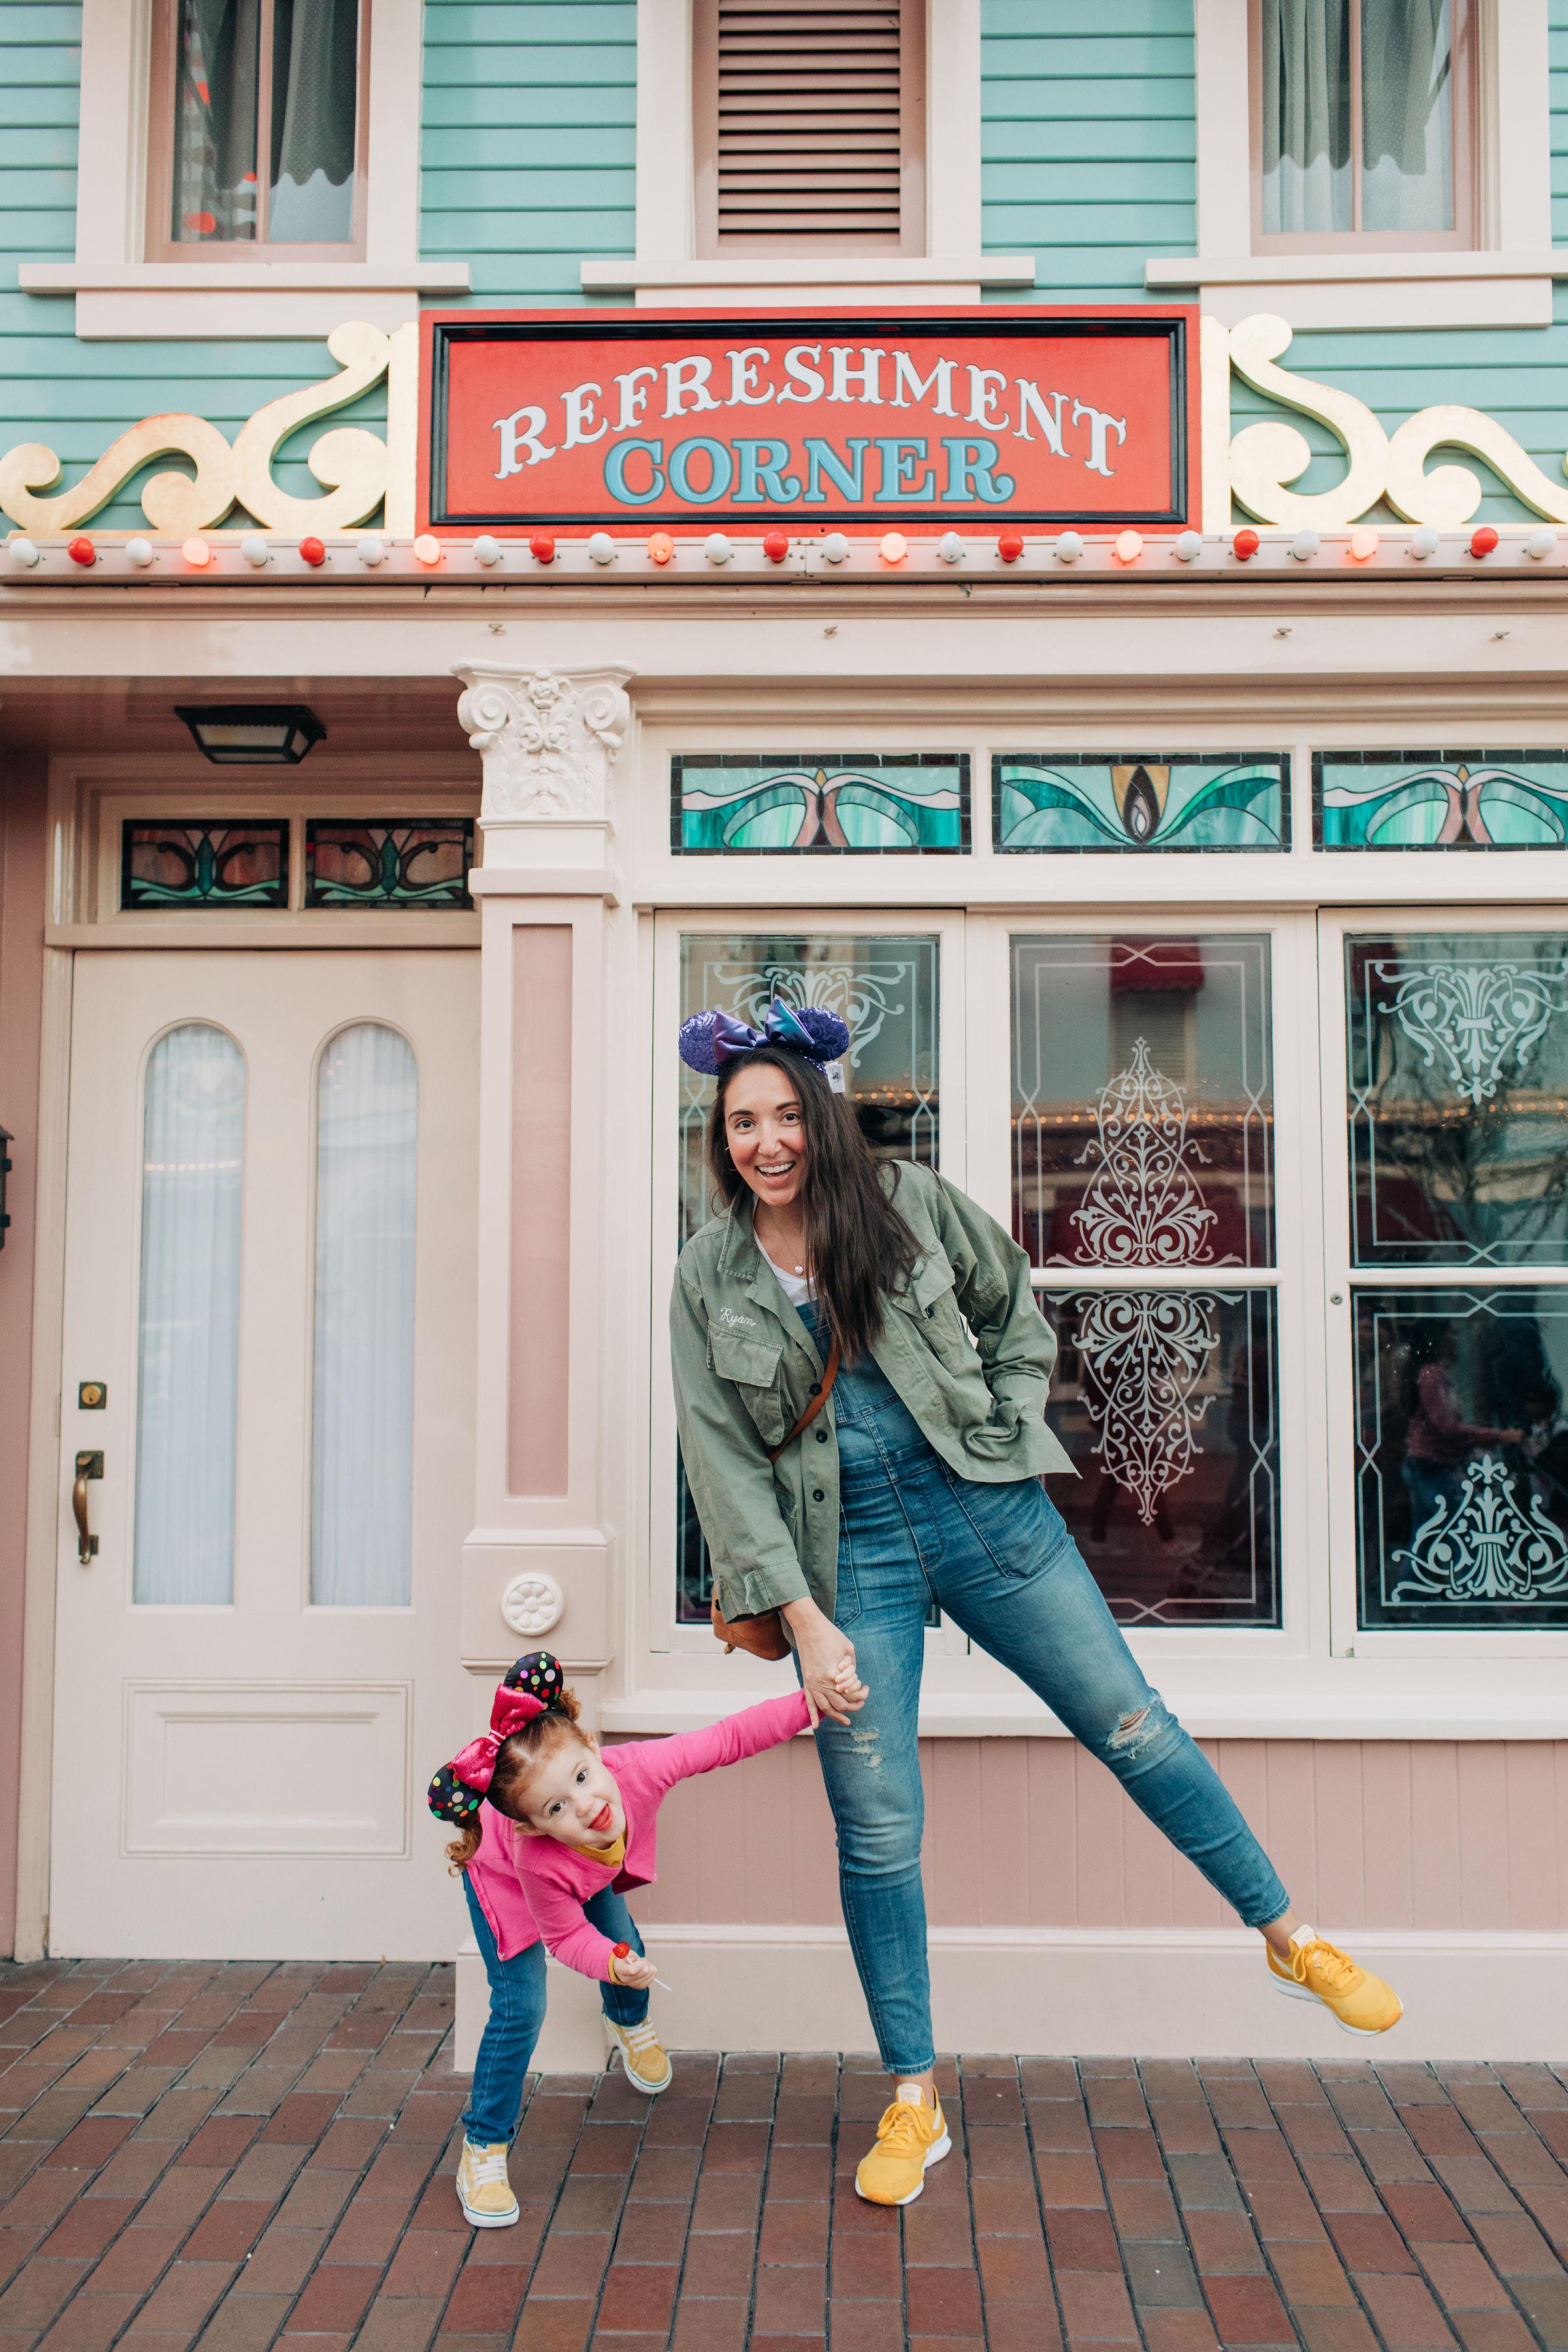 Baby_Boy_Bakery_Disneyland_LilyRoPhotography-7458.jpg